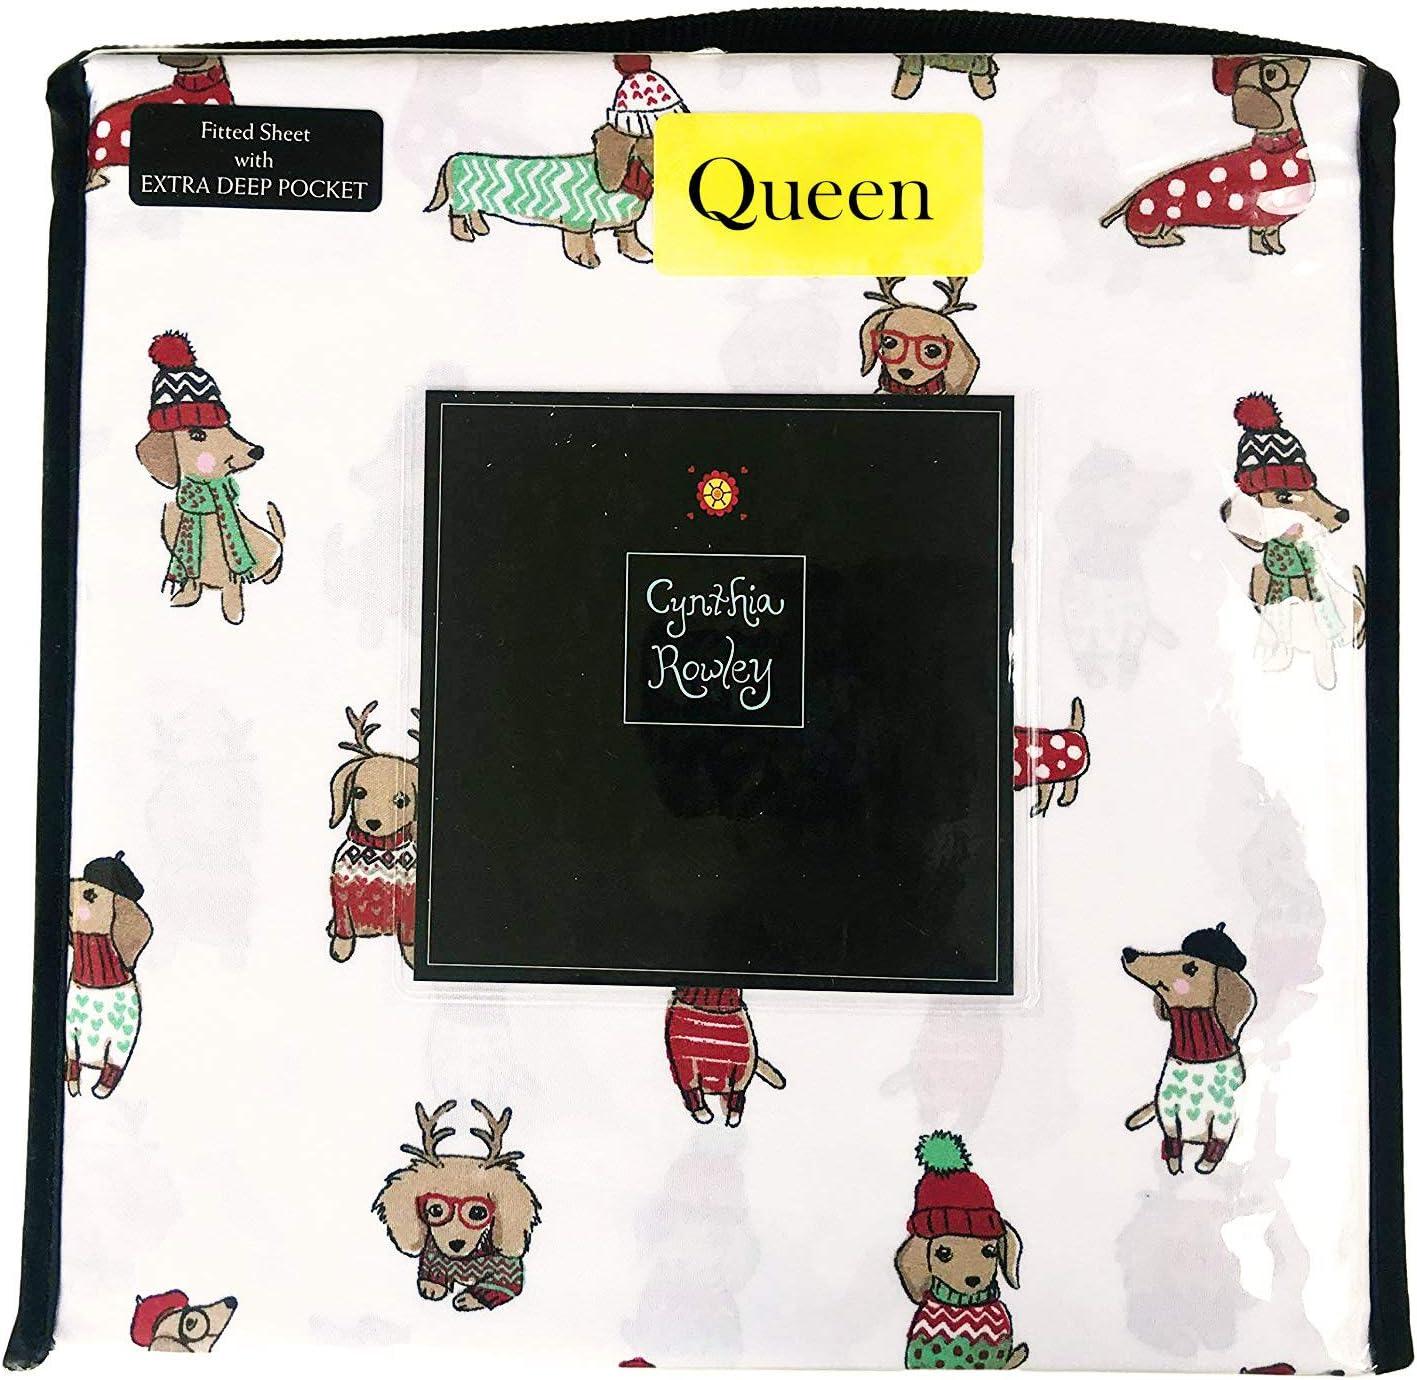 Cynthia Rowley Festive Dachshund Winner Dogs Dressed in Winter Attire Christmas Holiday Sheet Set (Queen)